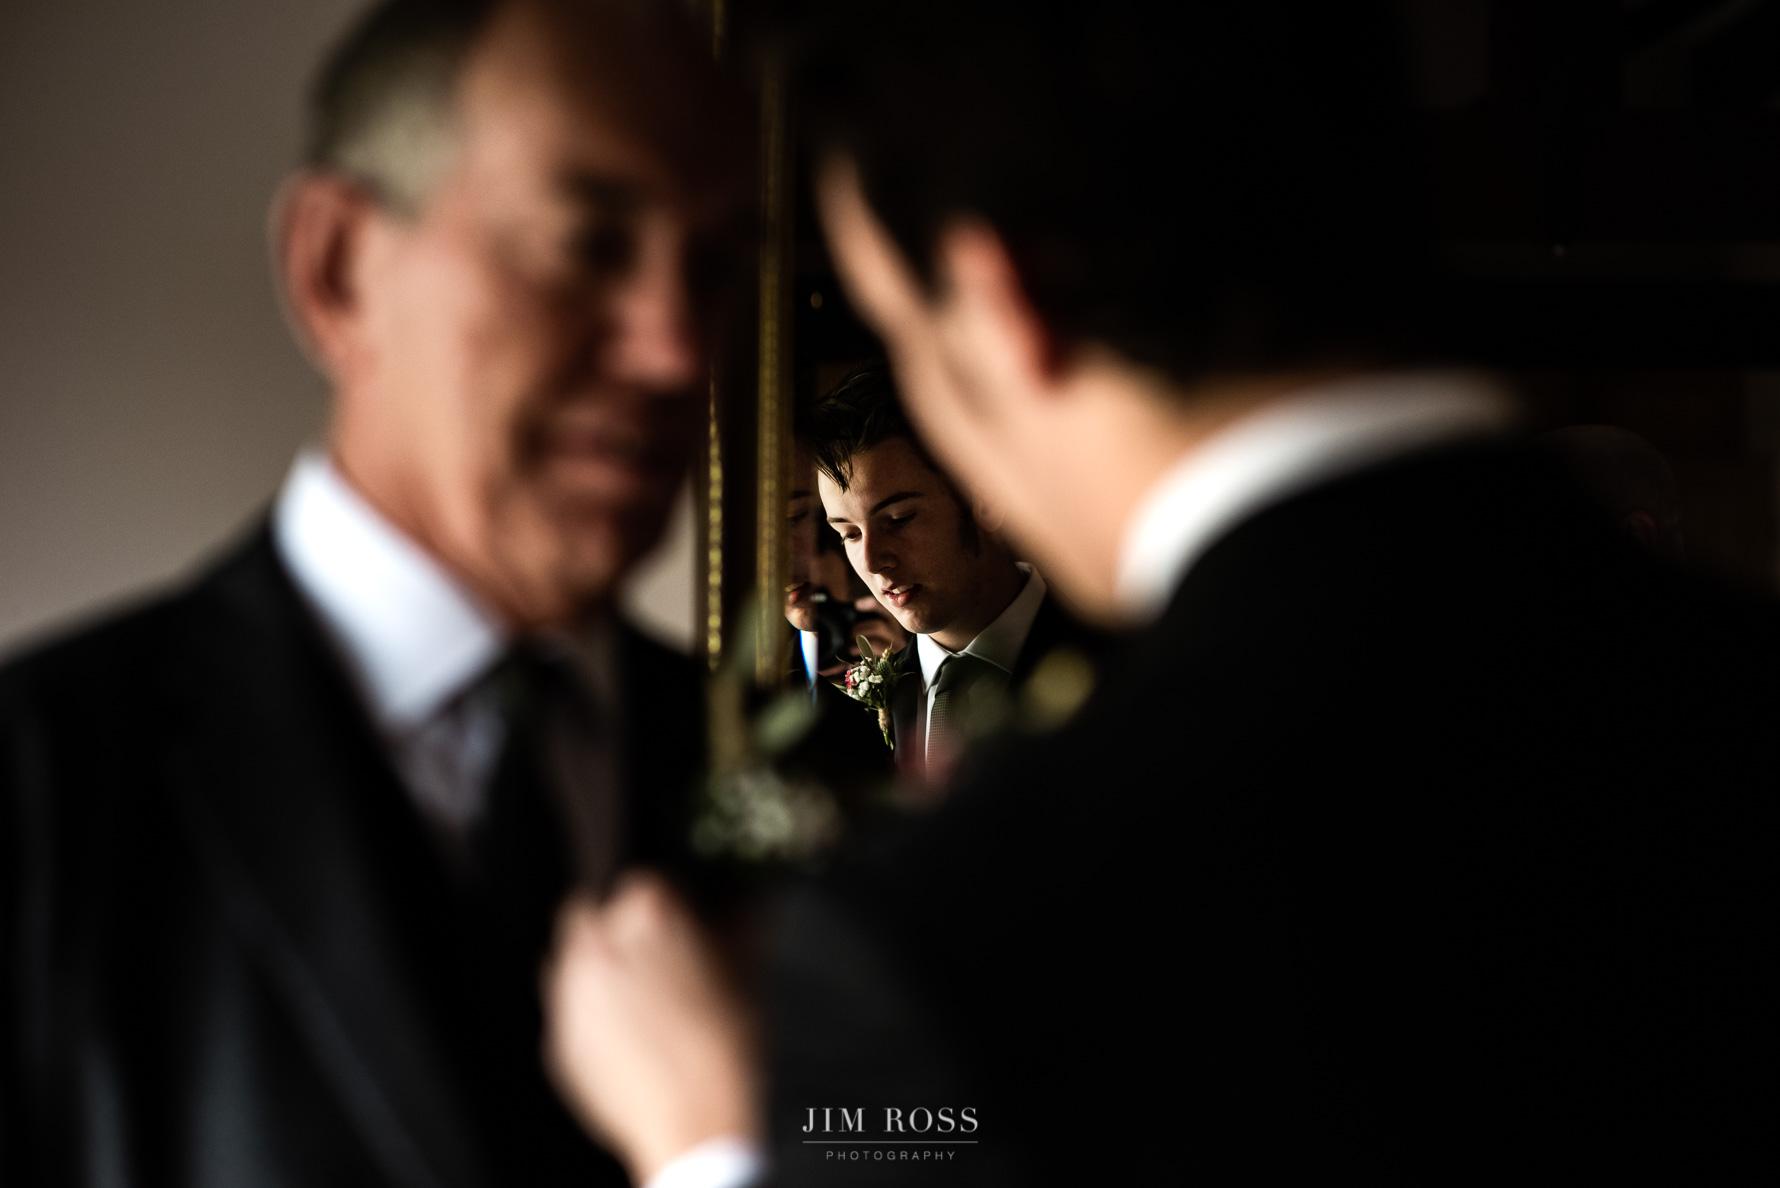 Buttonhole mirror reflection